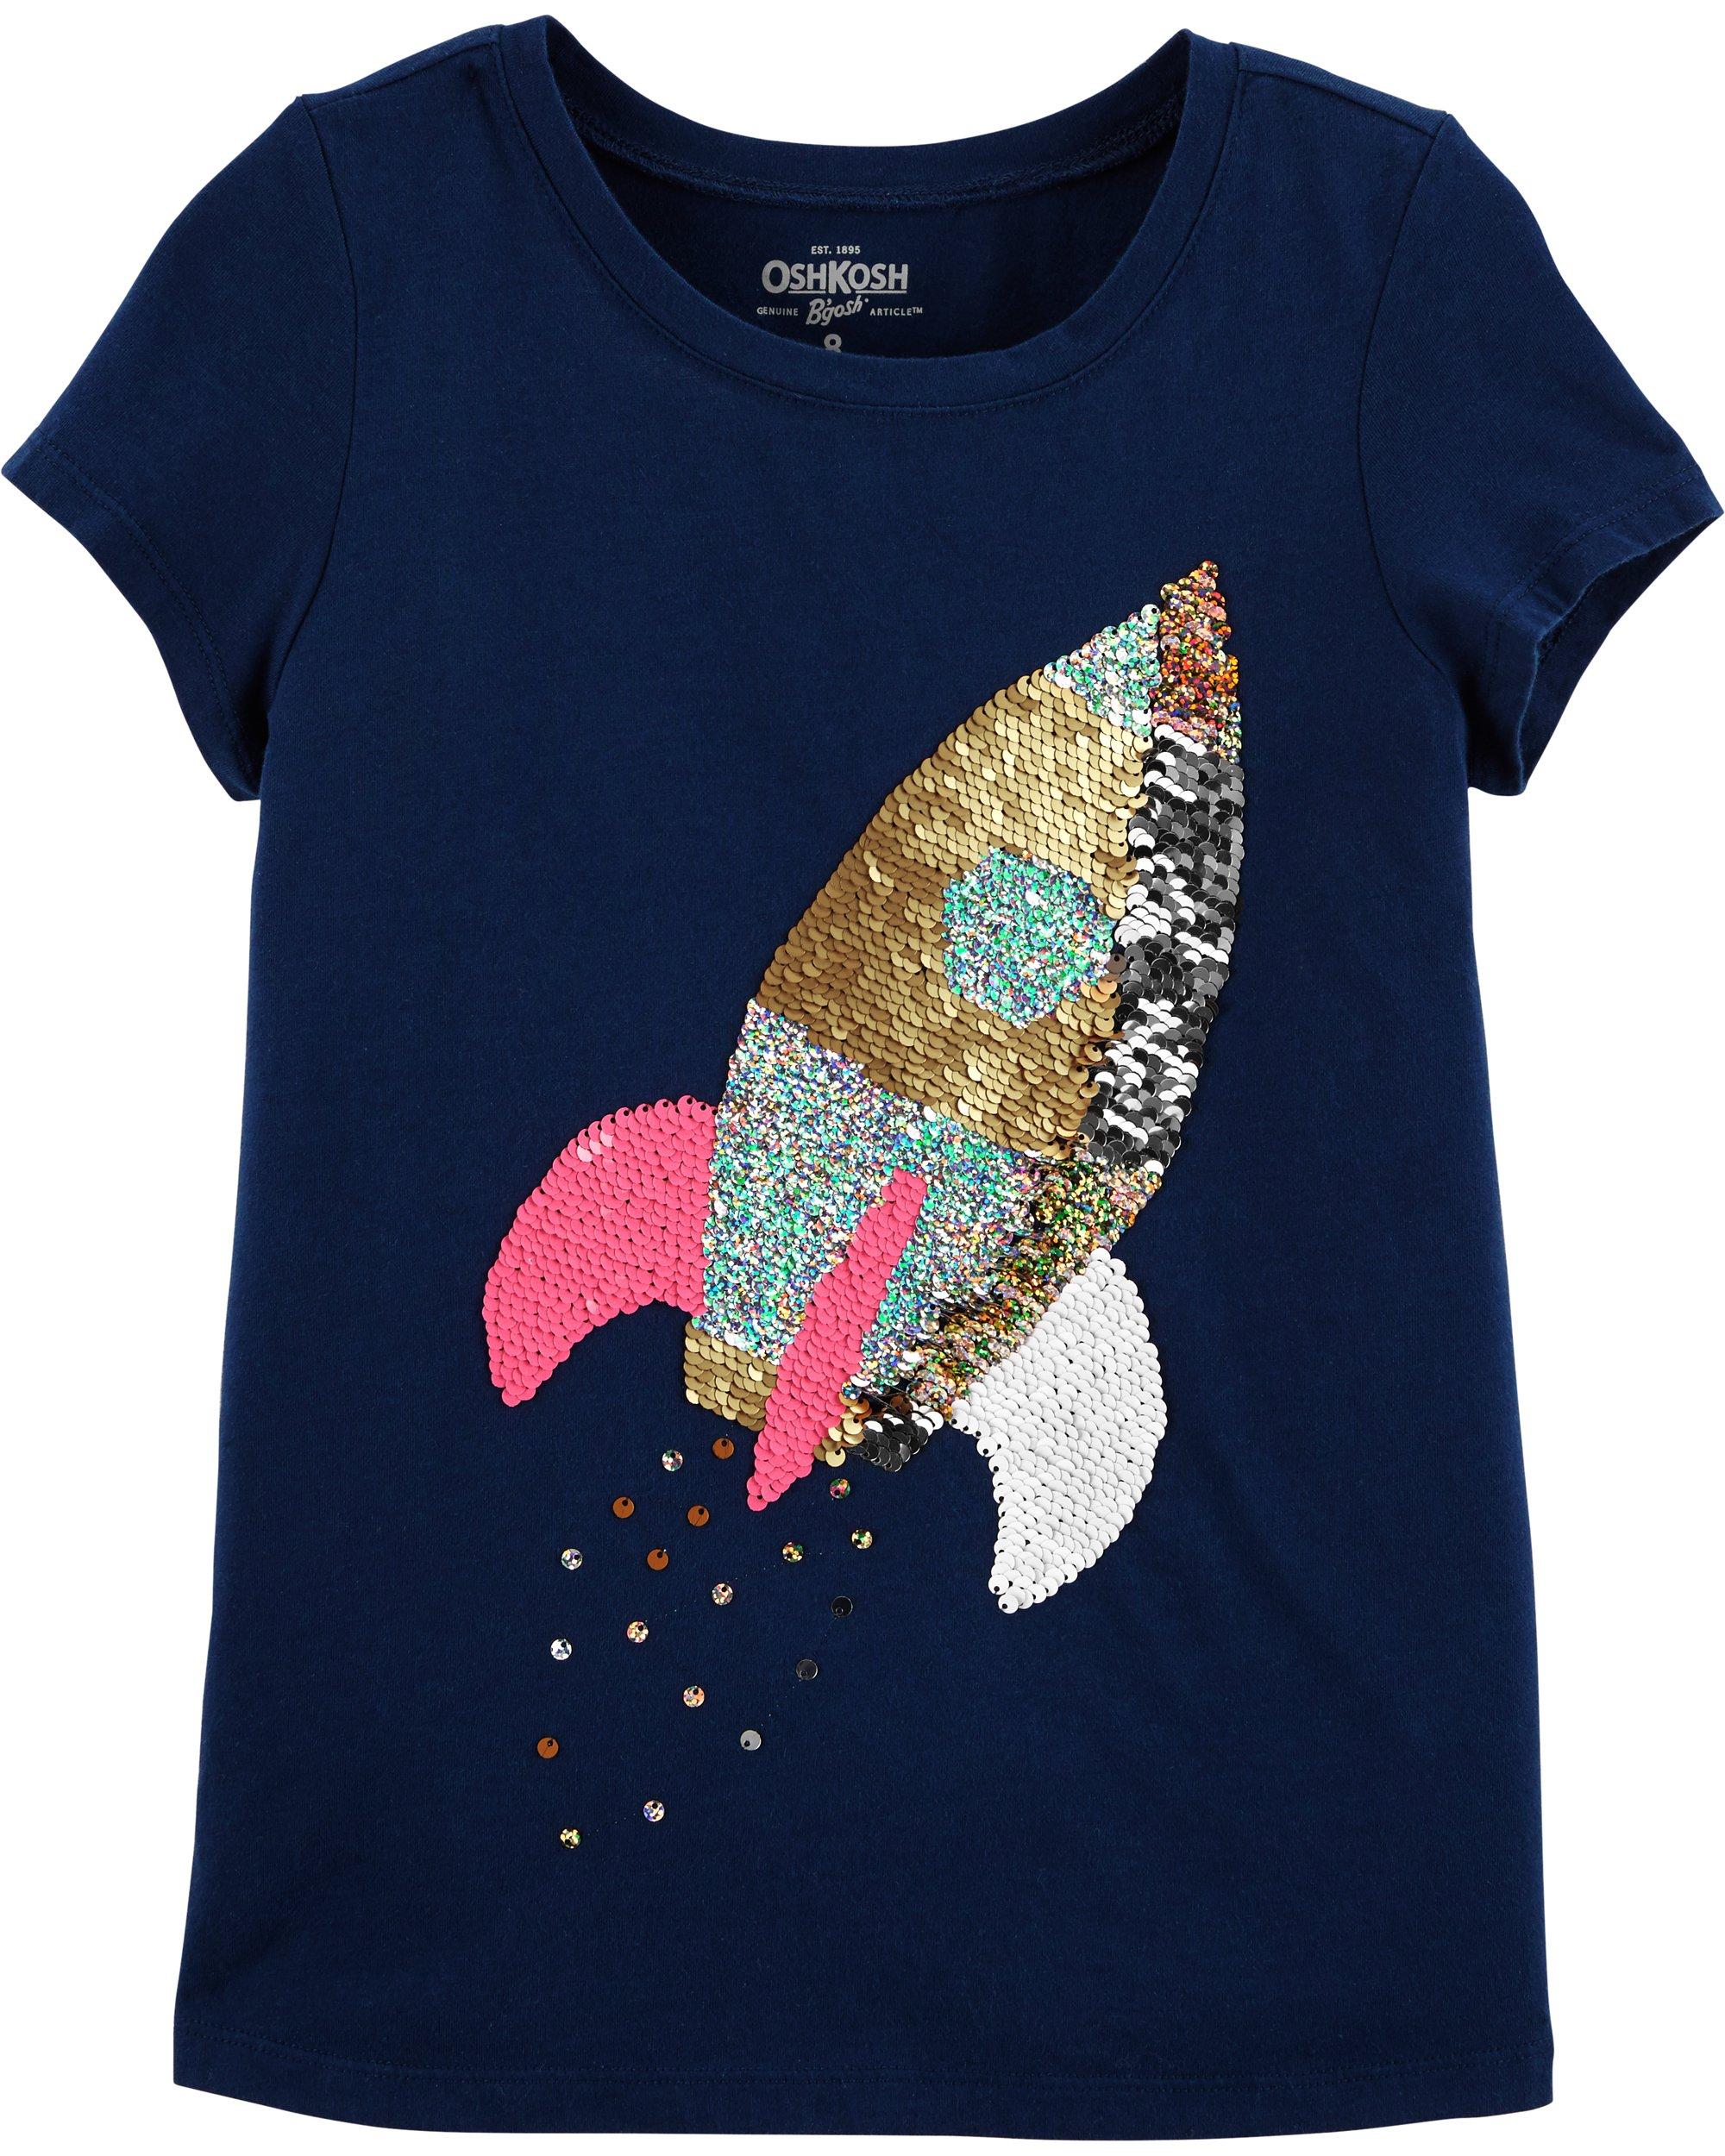 Osh Kosh Girls' Kids Sequin Tee, Navy Rocket, 7